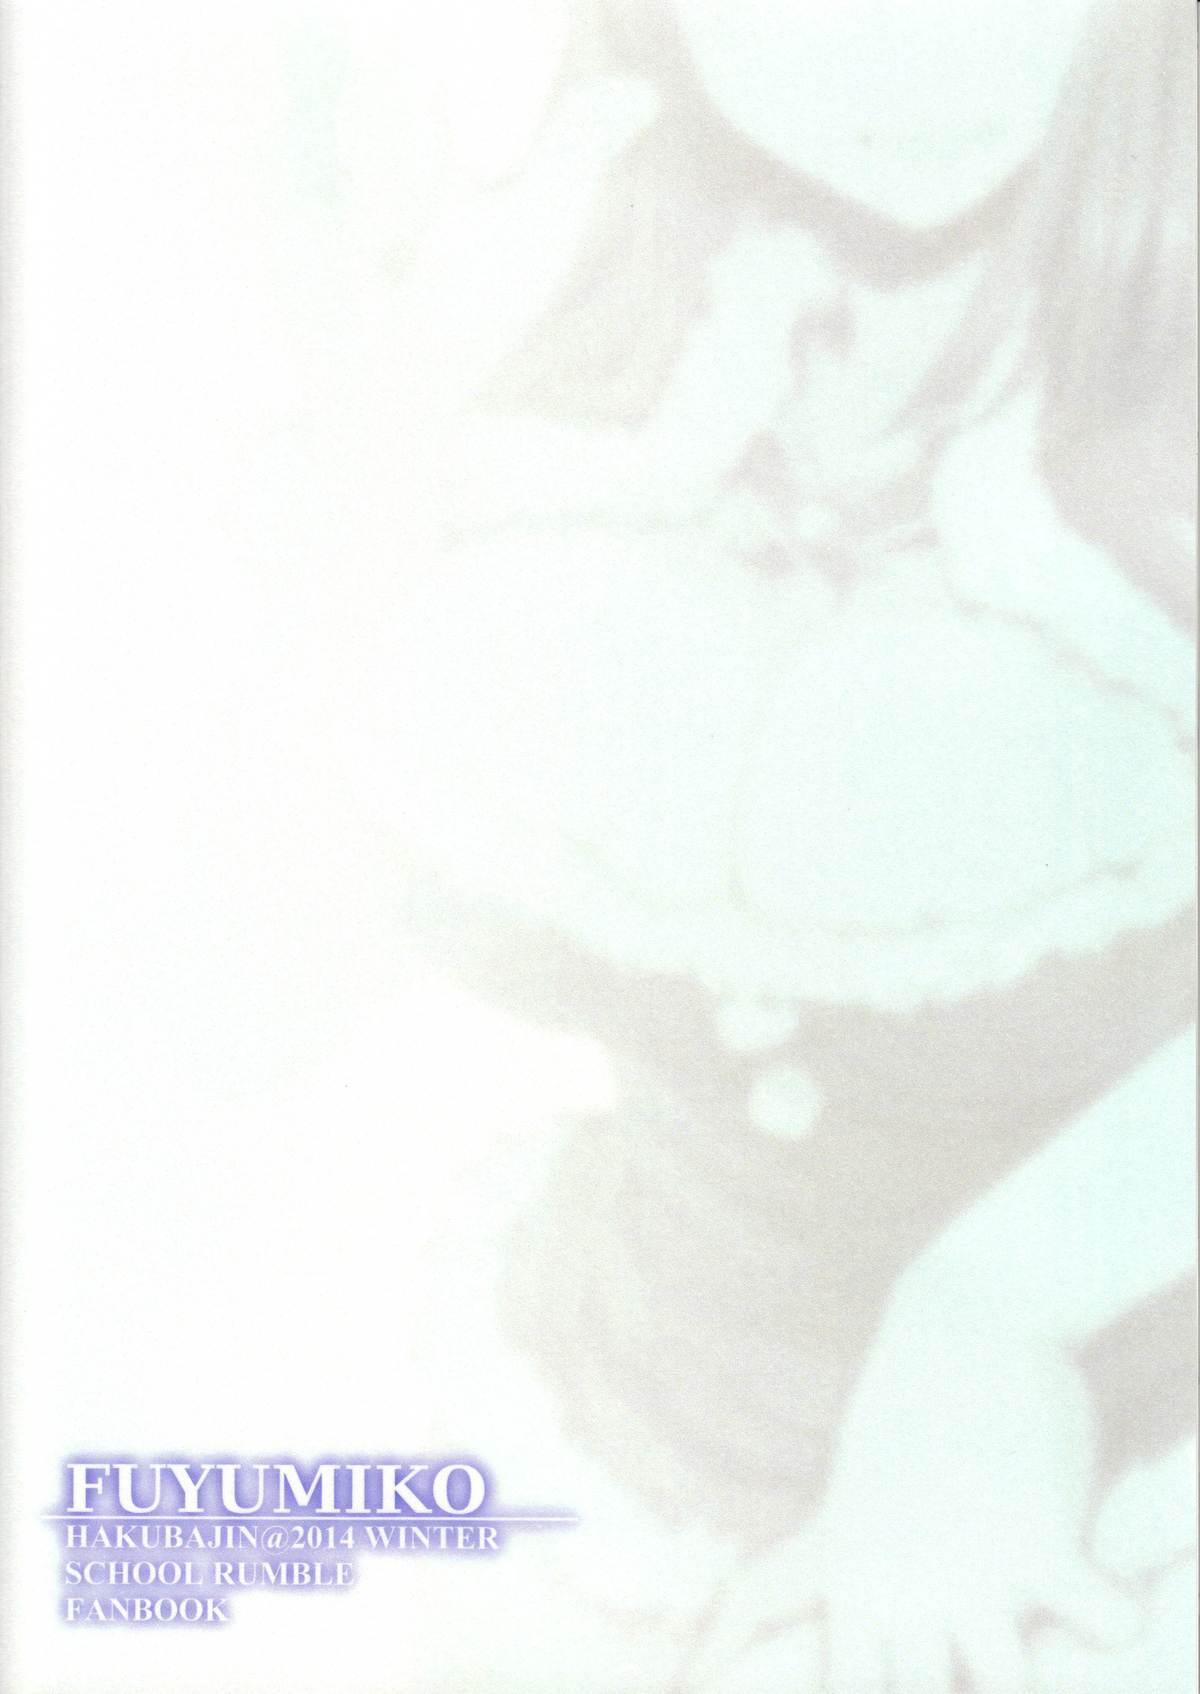 Fuyumiko 22